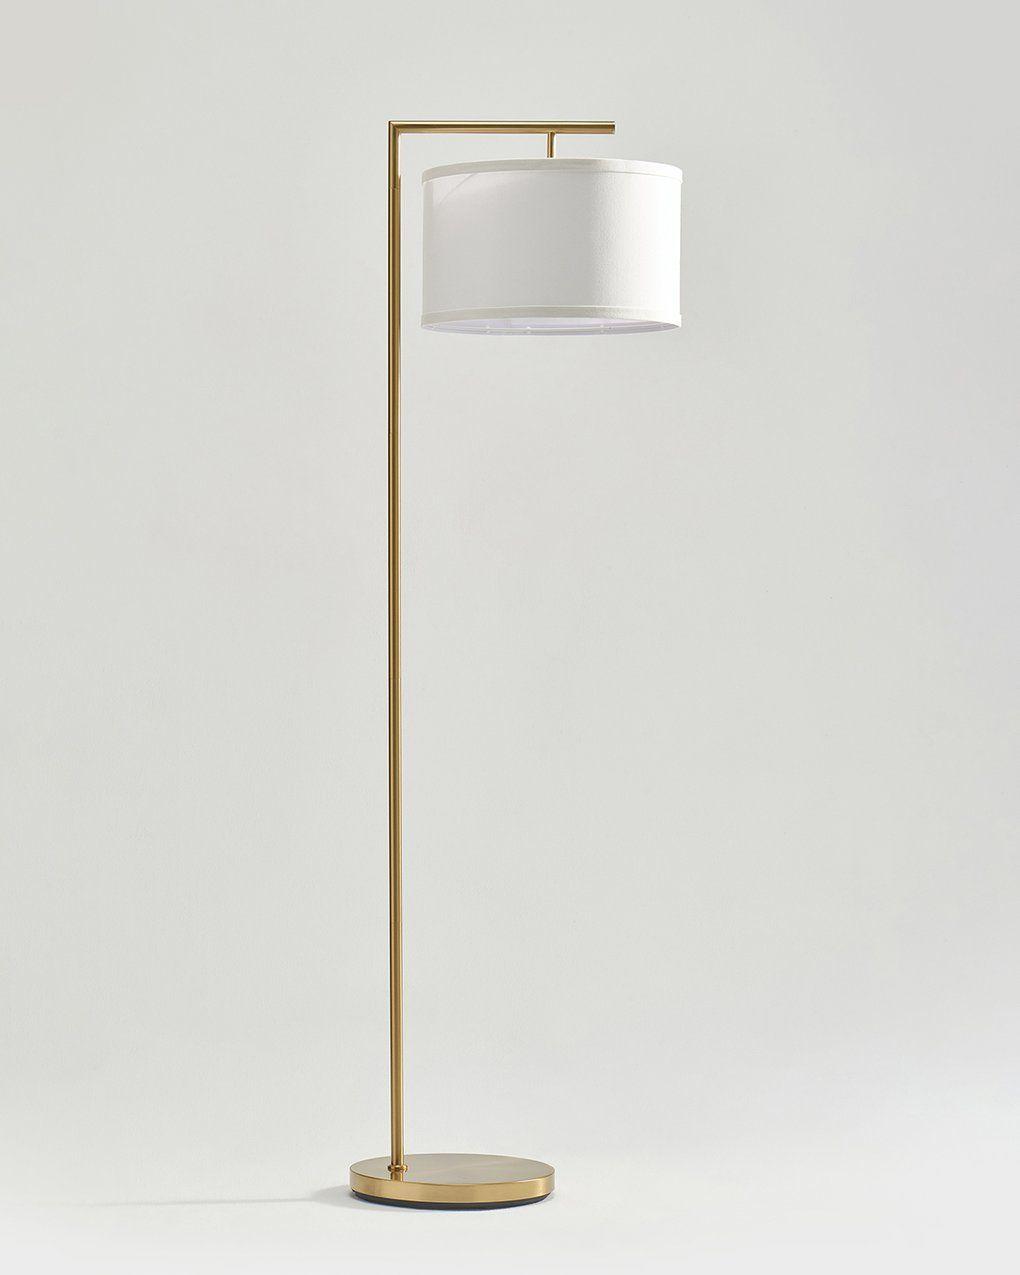 Montage Modern Floor Lamp In 2020 Modern Floor Lamps Floor Lamp